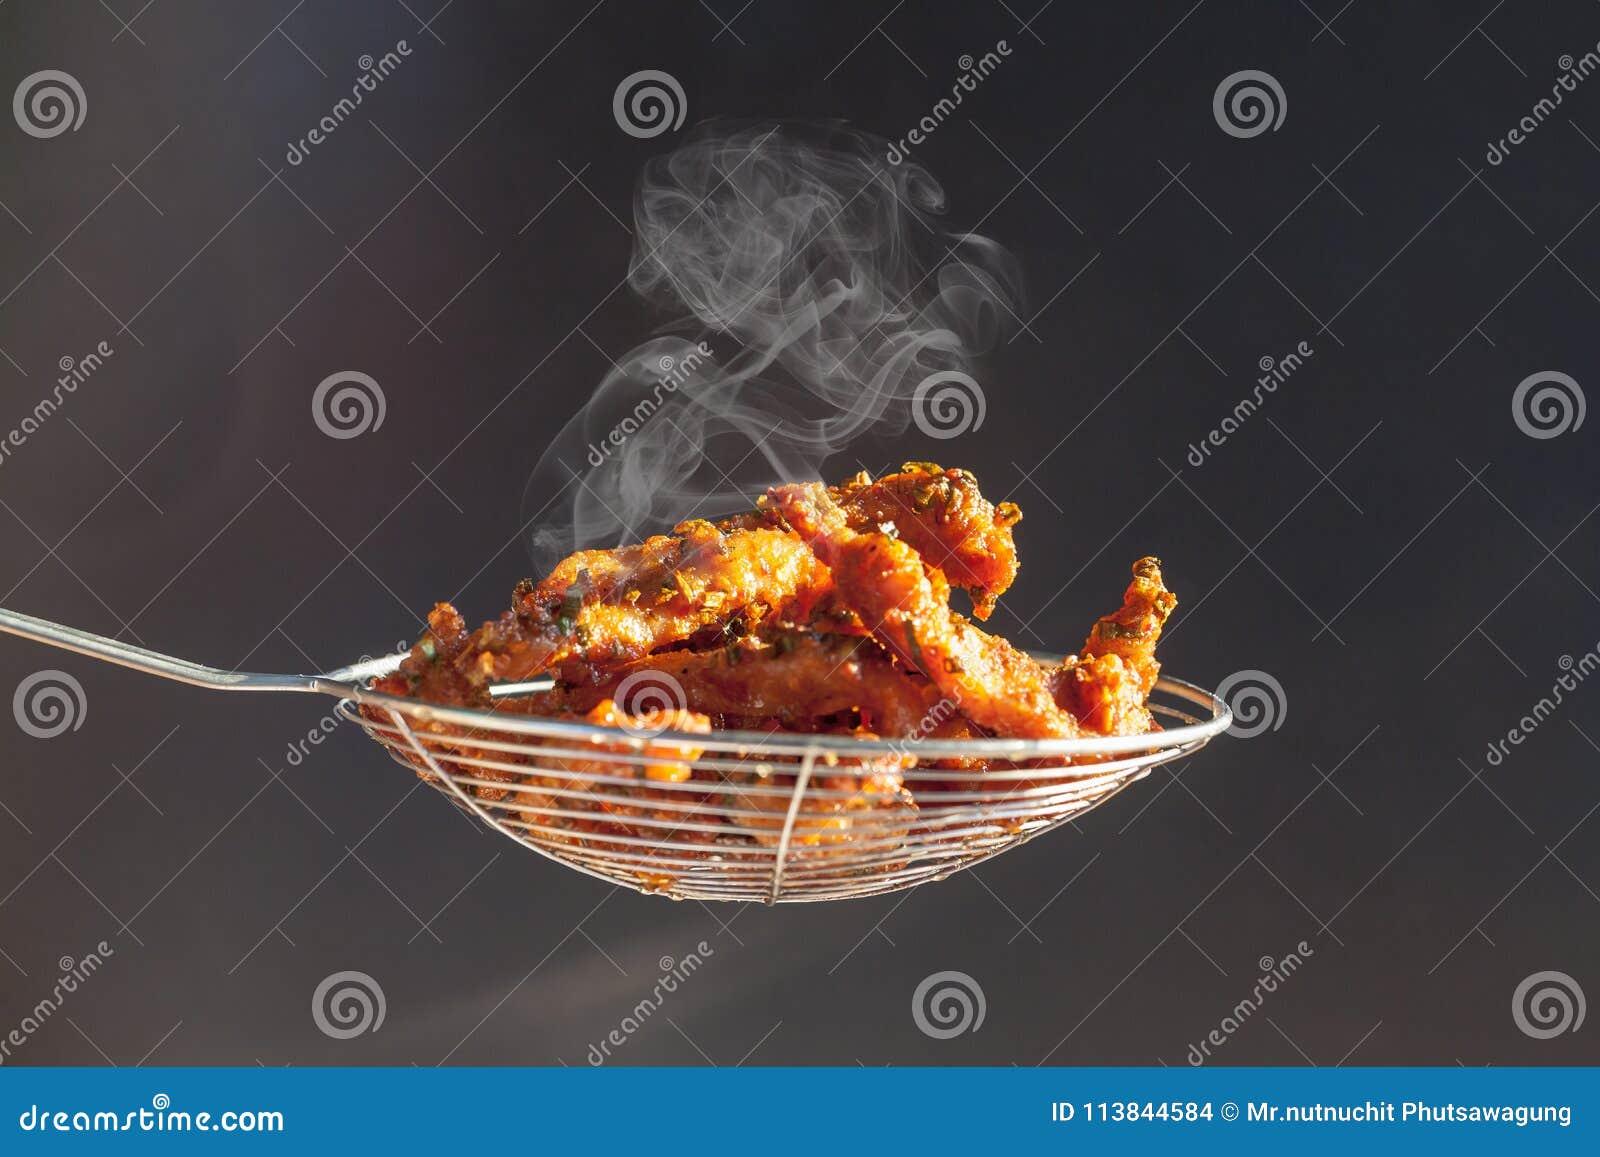 Cutlet χοιρινού κρέατος σε ένα καλάθι που τηγάνισε ακριβώς από το τηγάνι στην κουζίνα